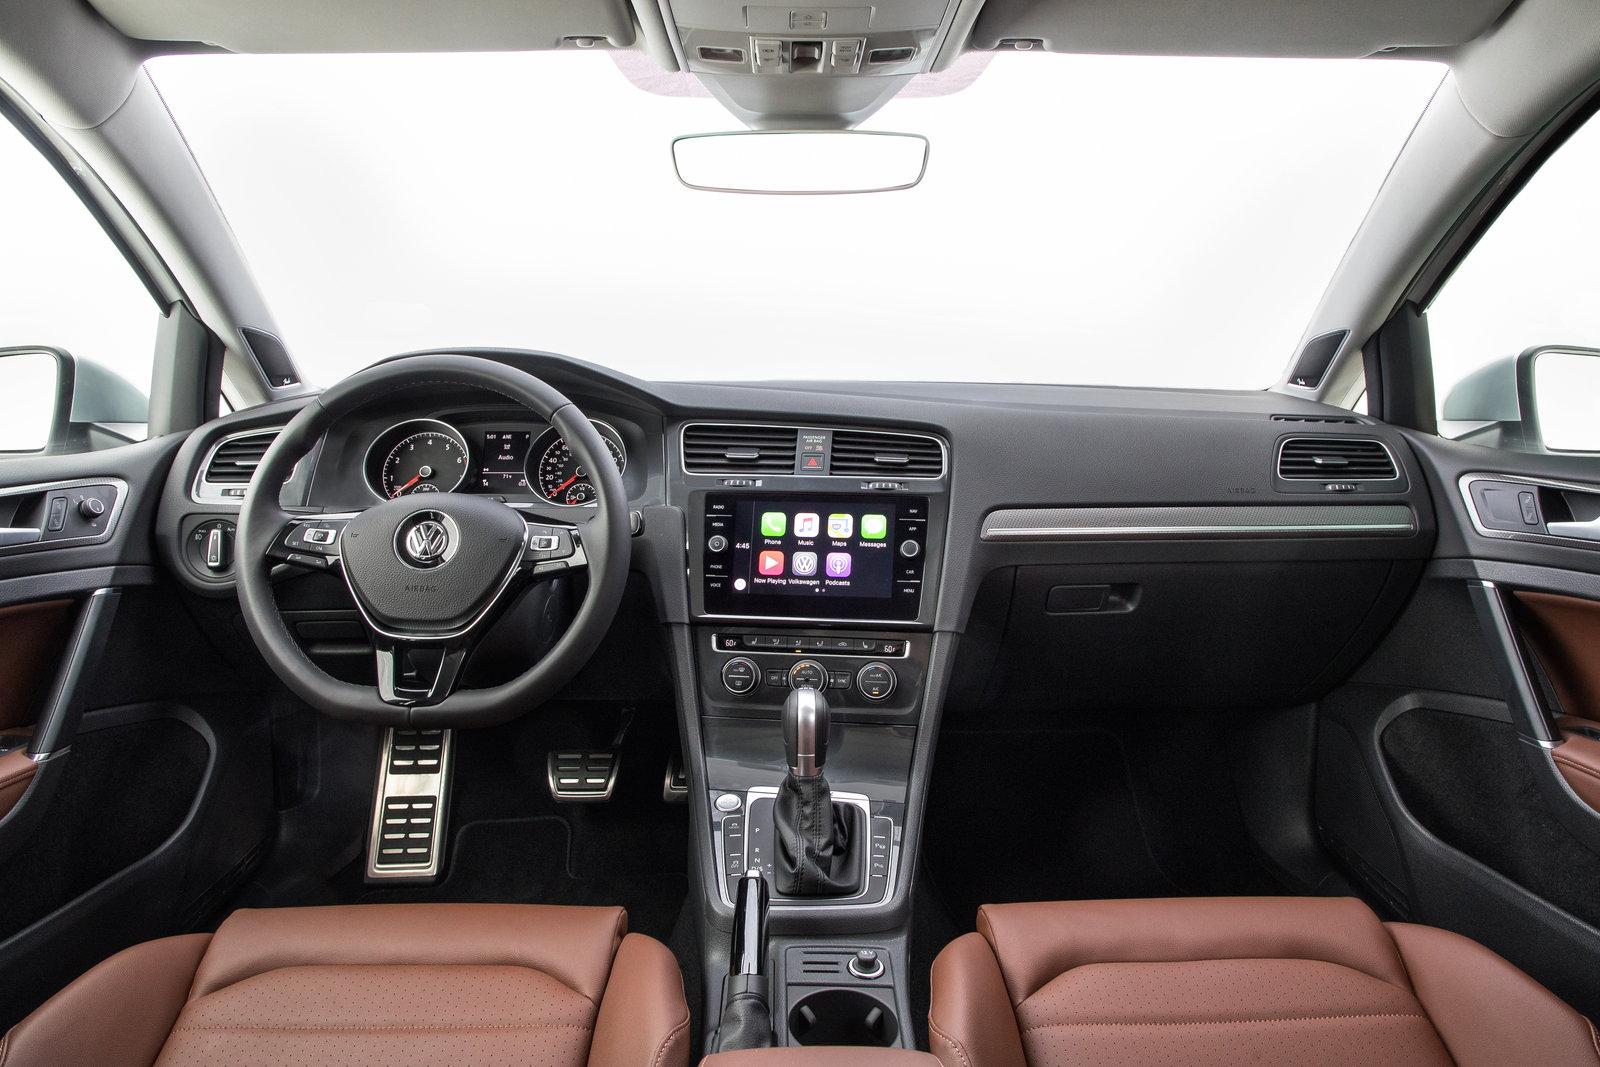 2019 Volkswagen Golf Alltrack: Preview, Pricing, Release Date